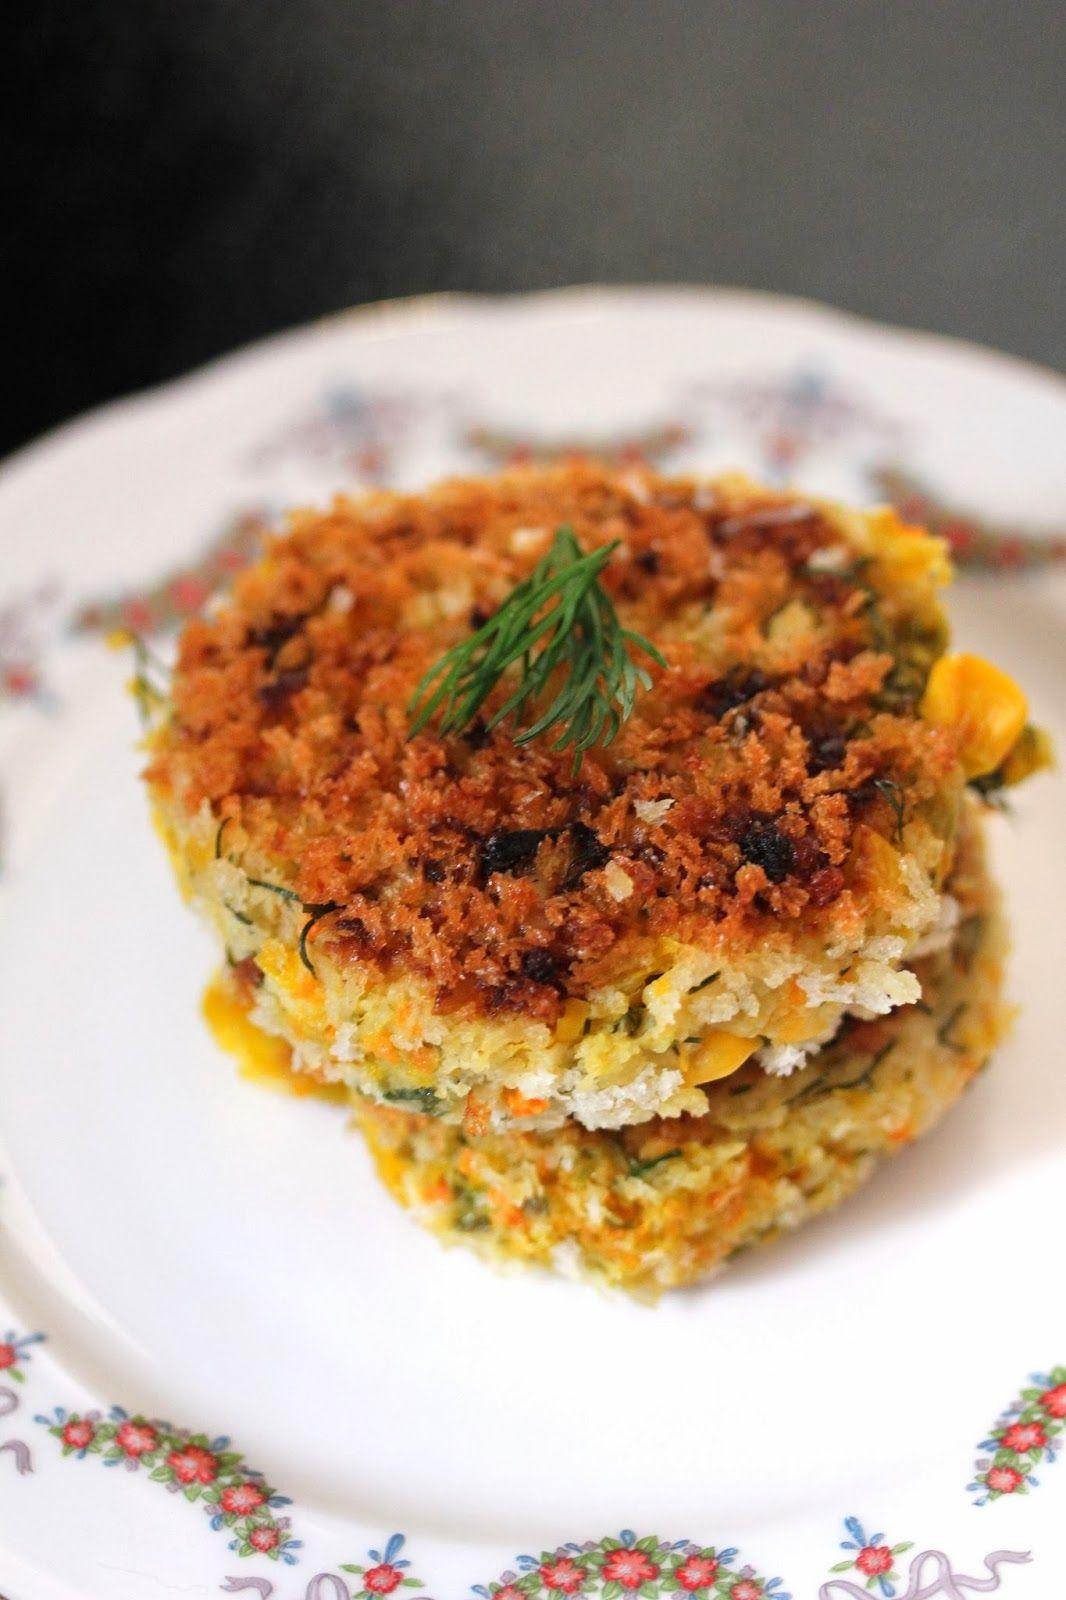 Kitchen grrrls vegan crab cakes aka hearts of palm cake